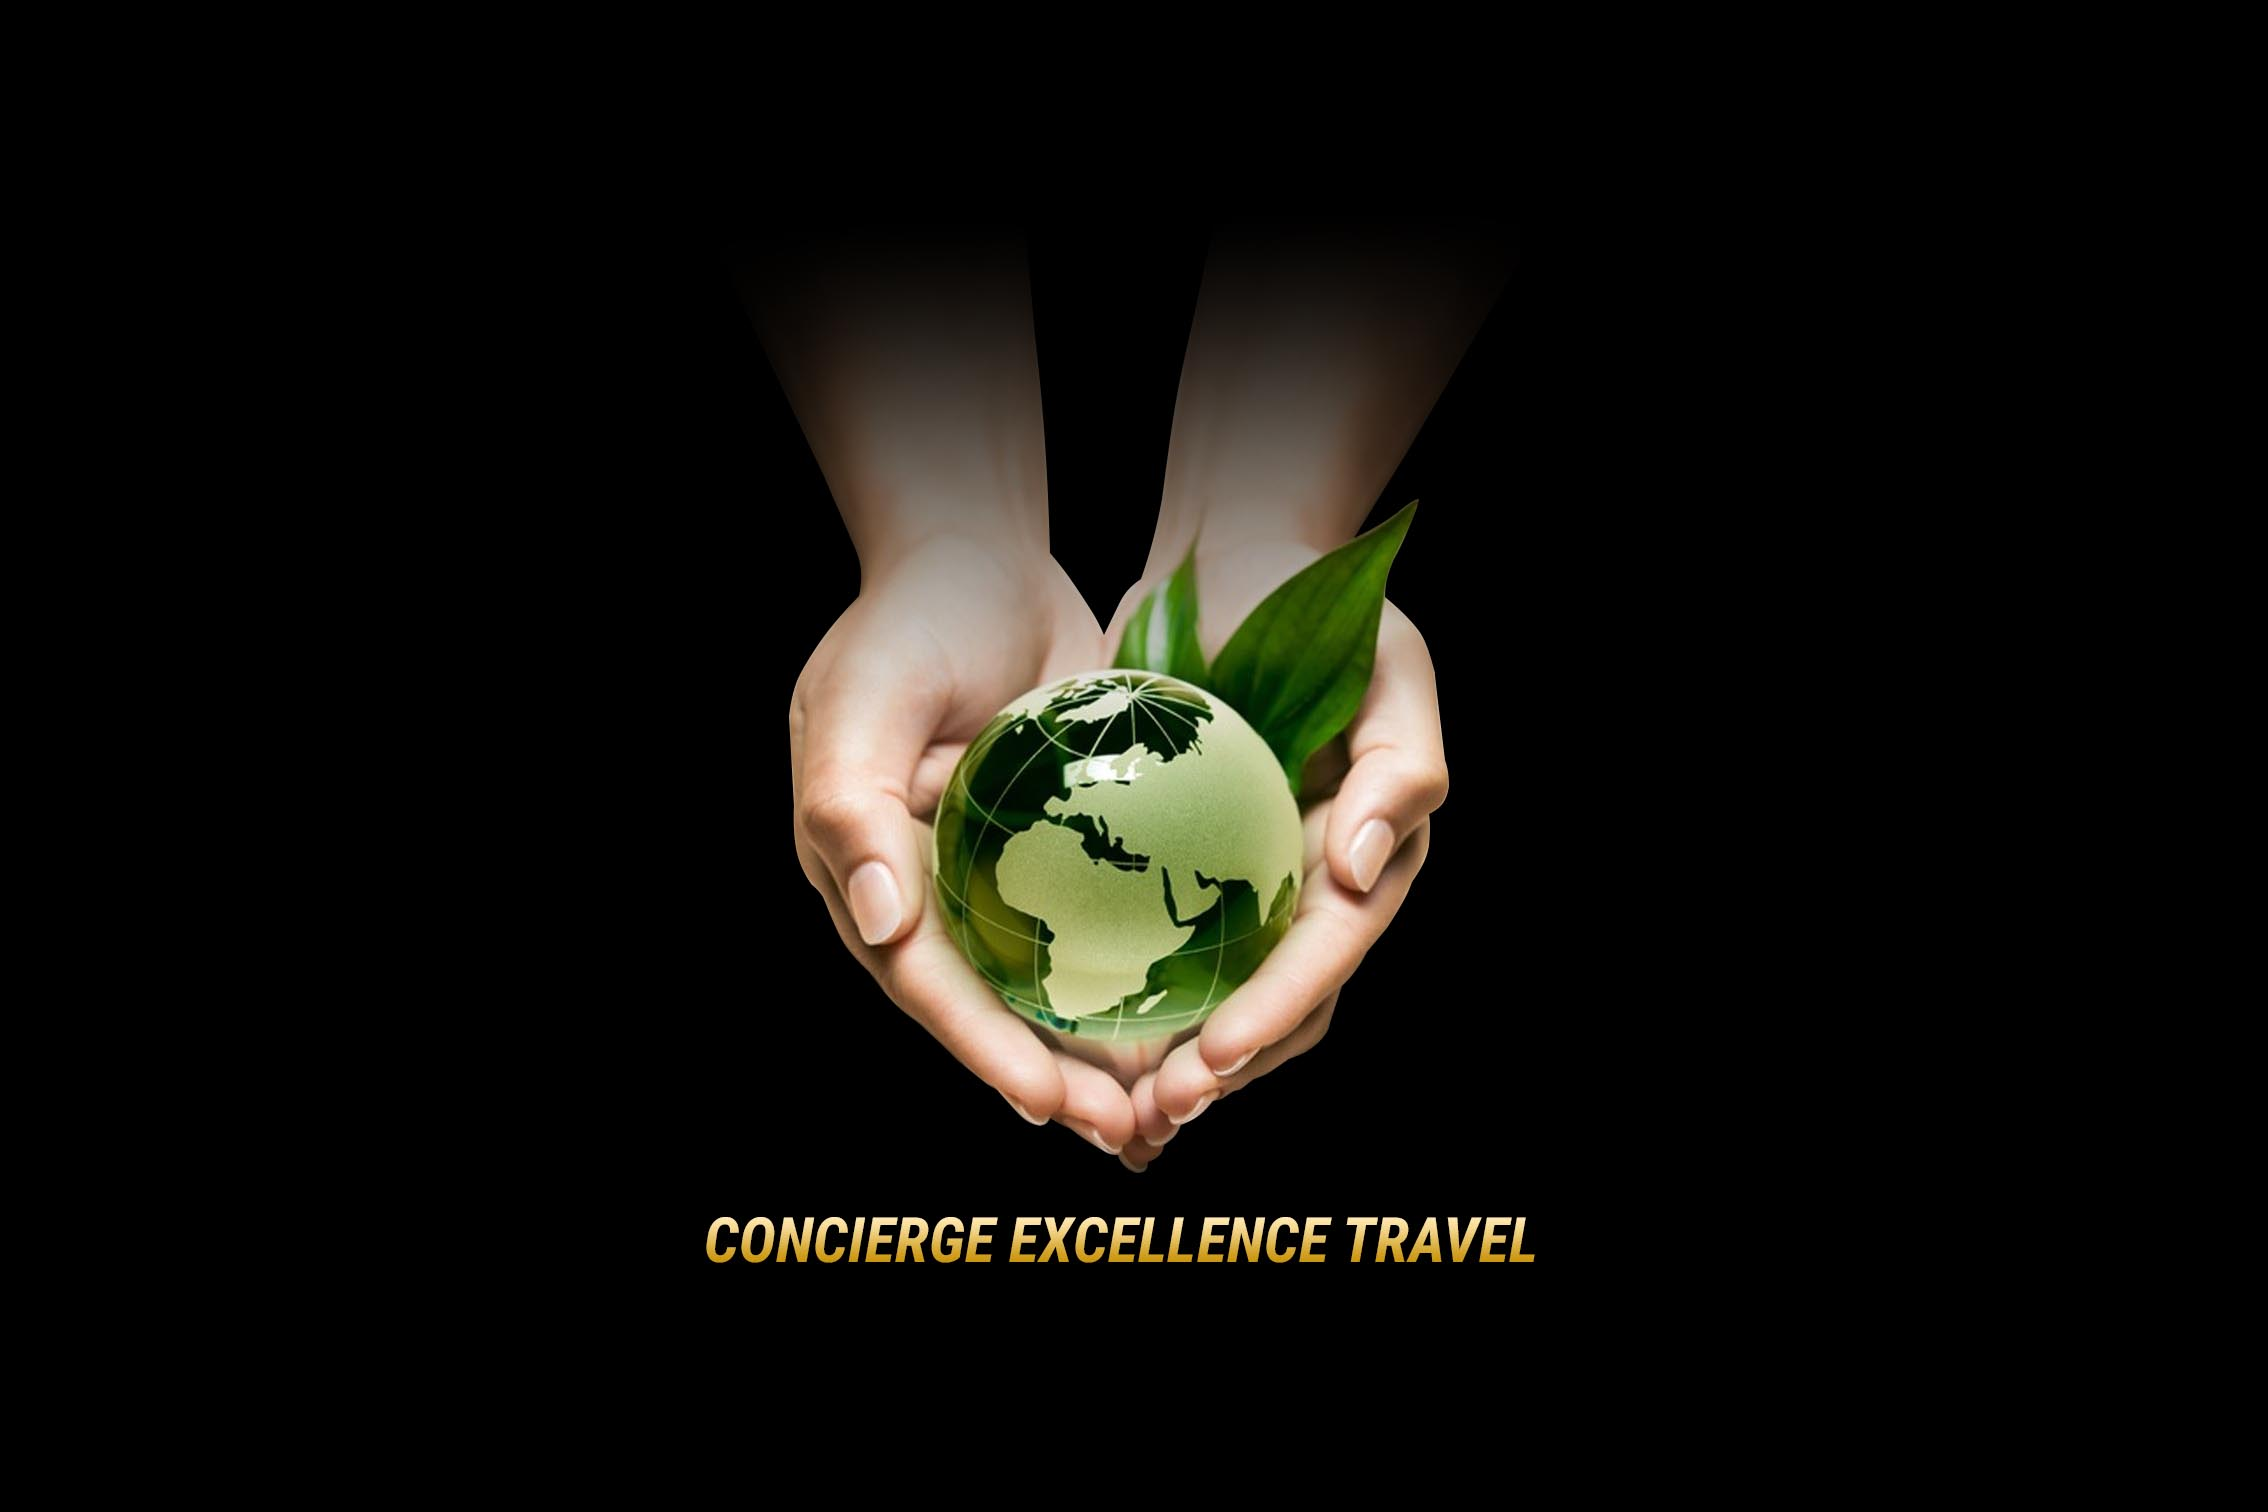 Excelence_Travel